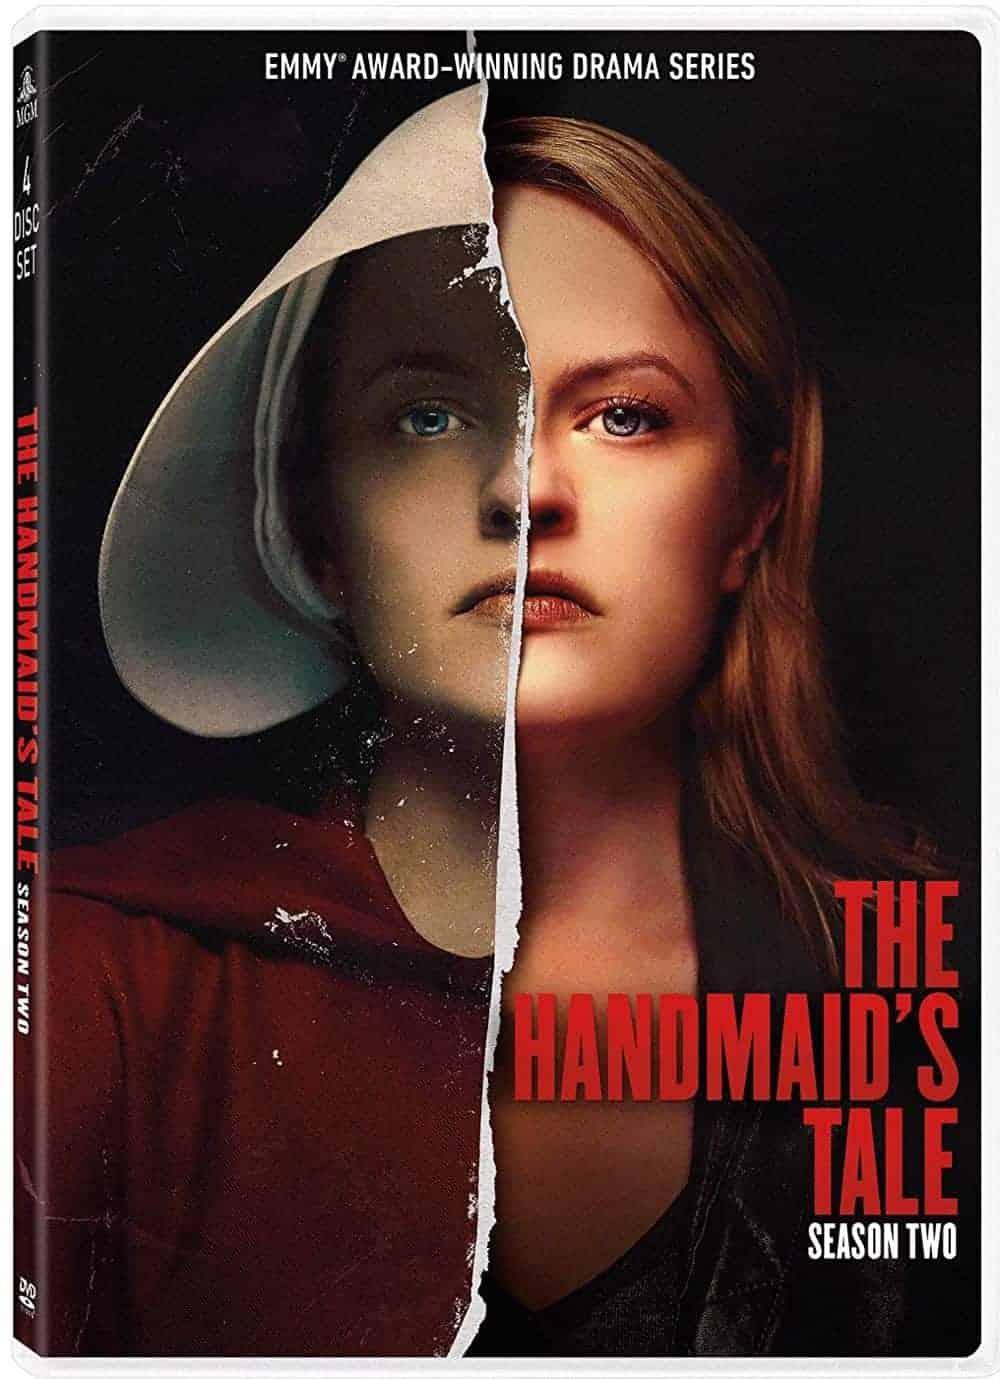 The Handmaid's Tale-Season 2 DVD